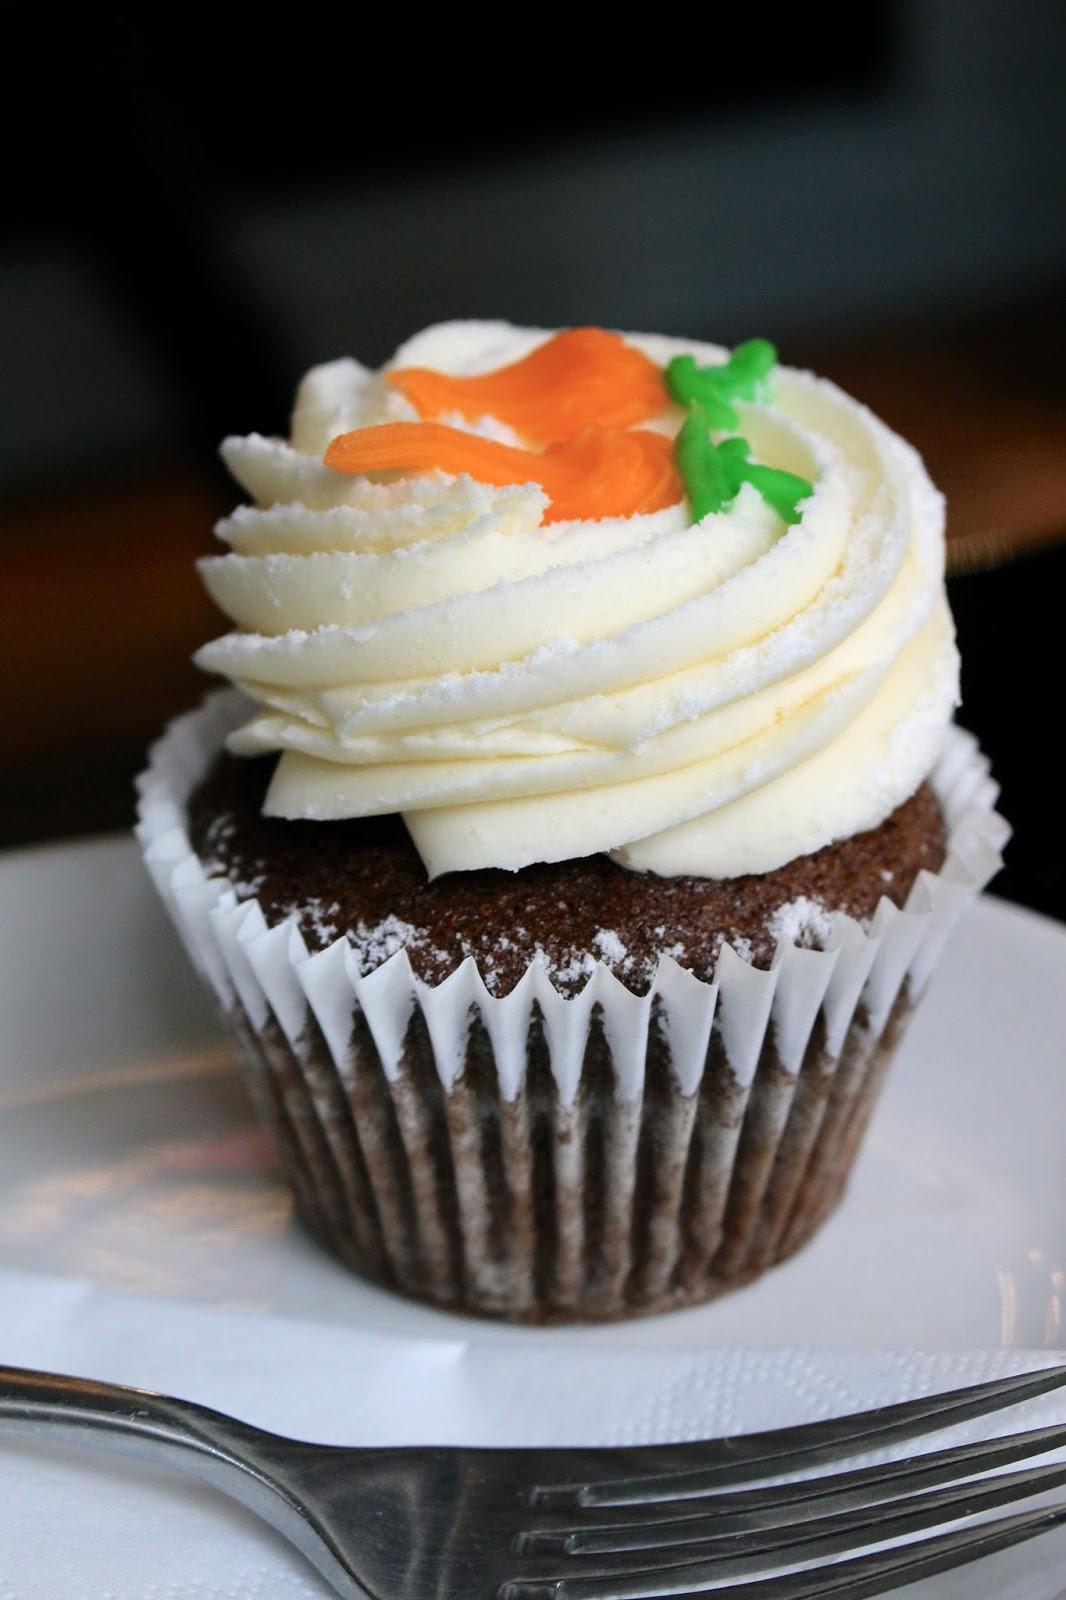 Edinburgh Mimi's Bakehouse cake review